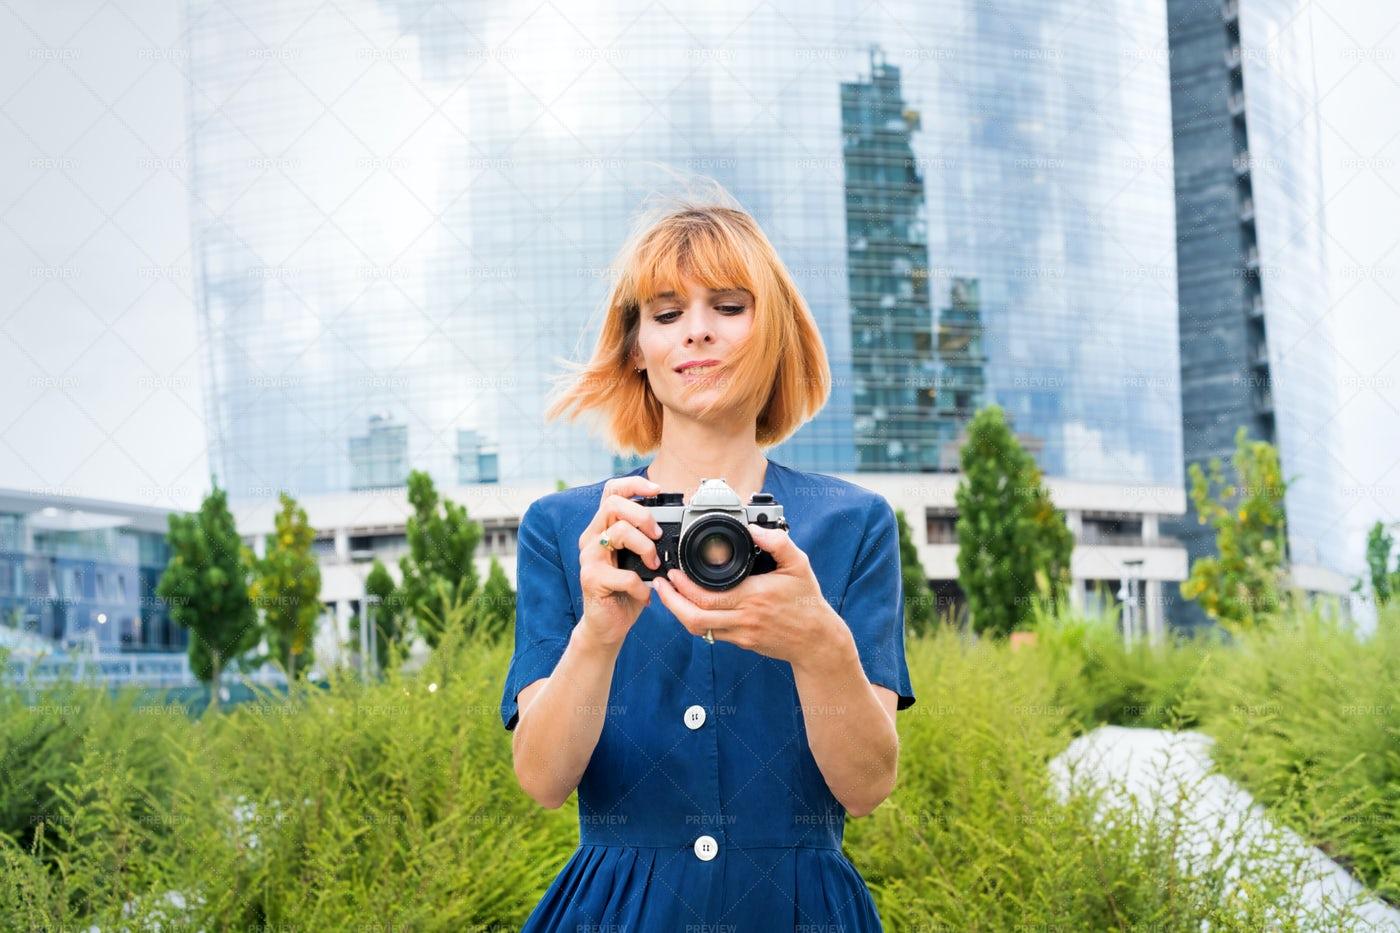 Taking Photos In The City: Stock Photos